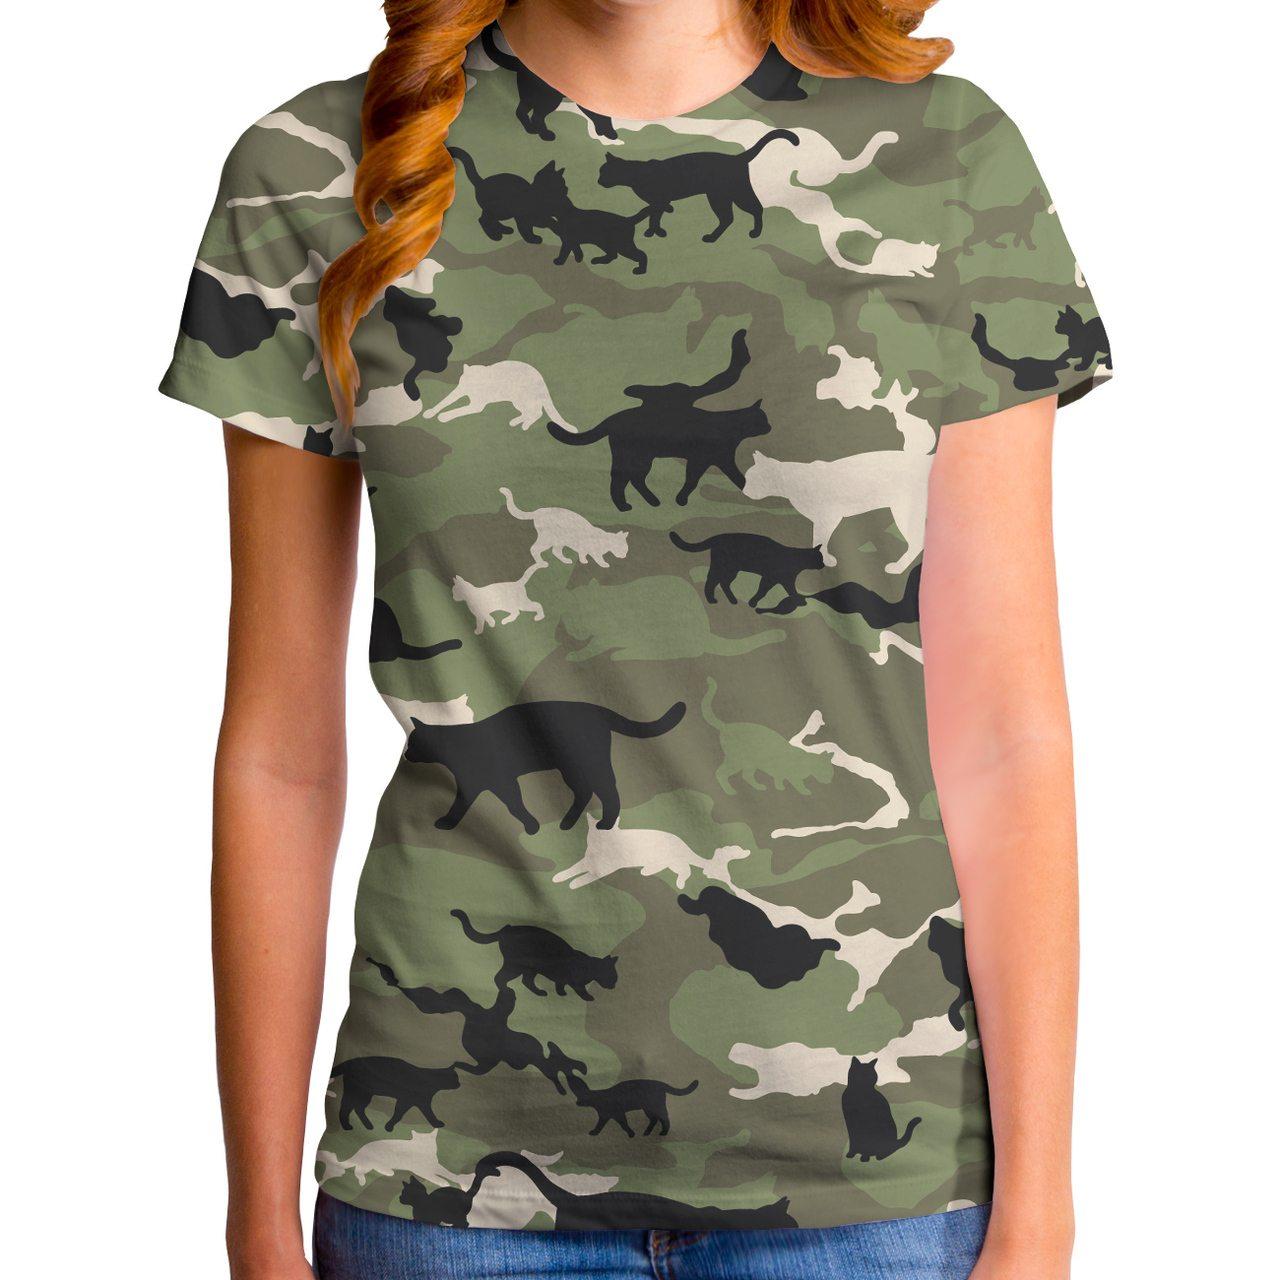 Catmouflage Women's T-Shirt